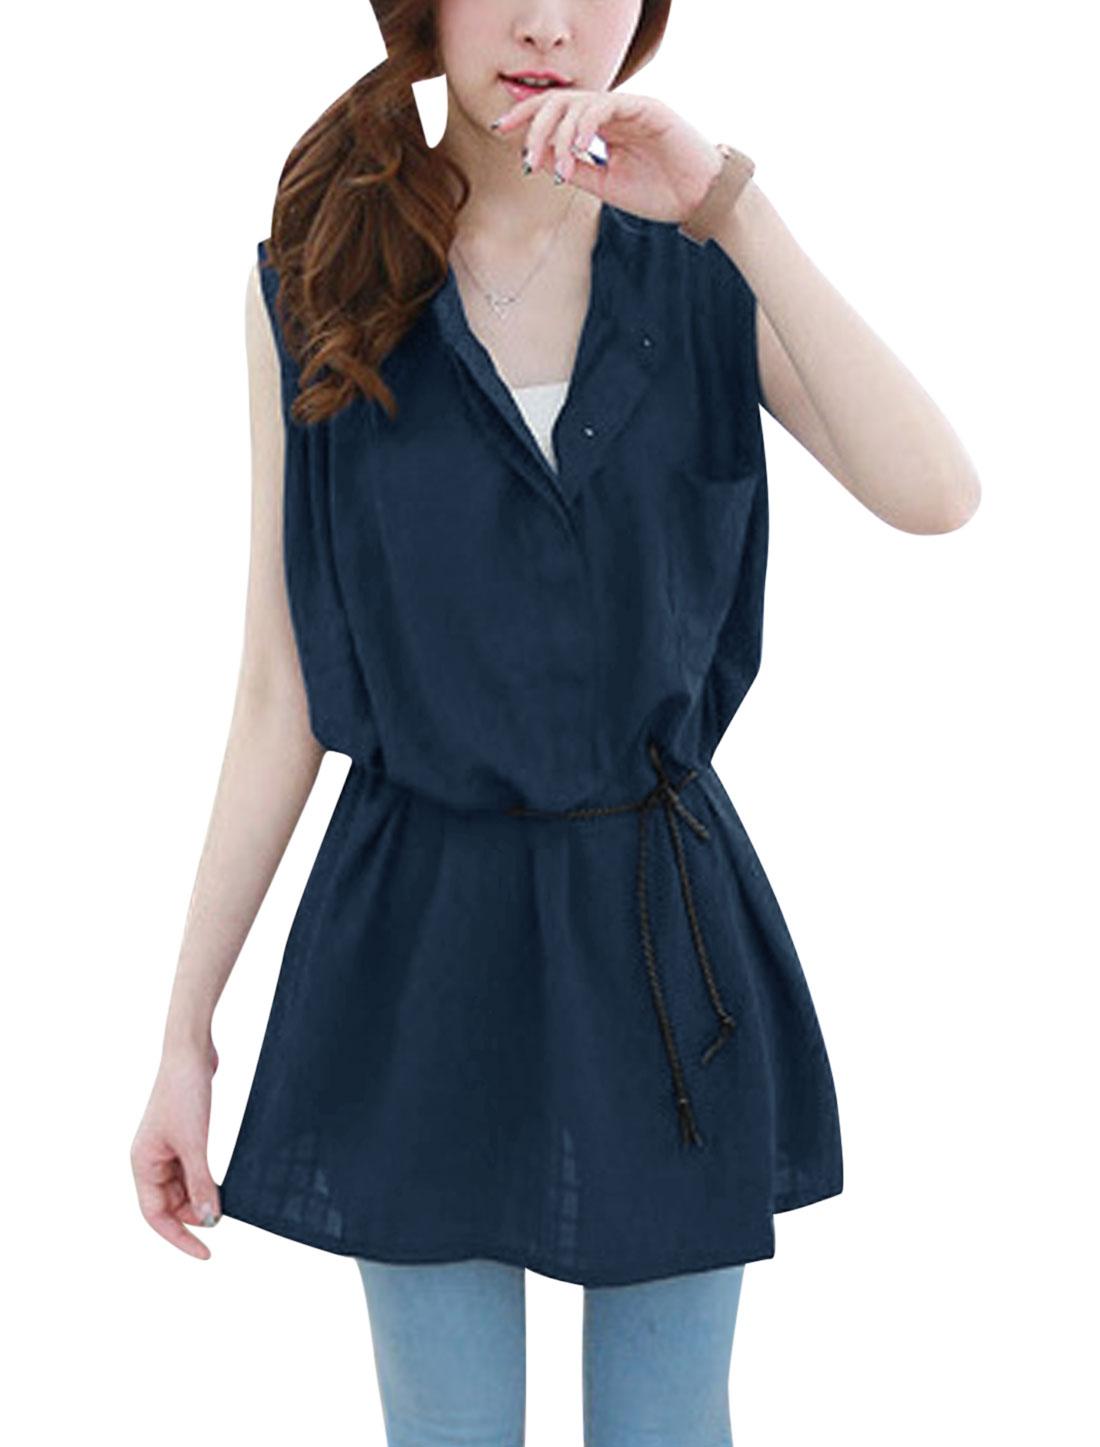 Ladies Bust Pocket Self Tie String Sweet Linen Top Shirt Navy Blue S